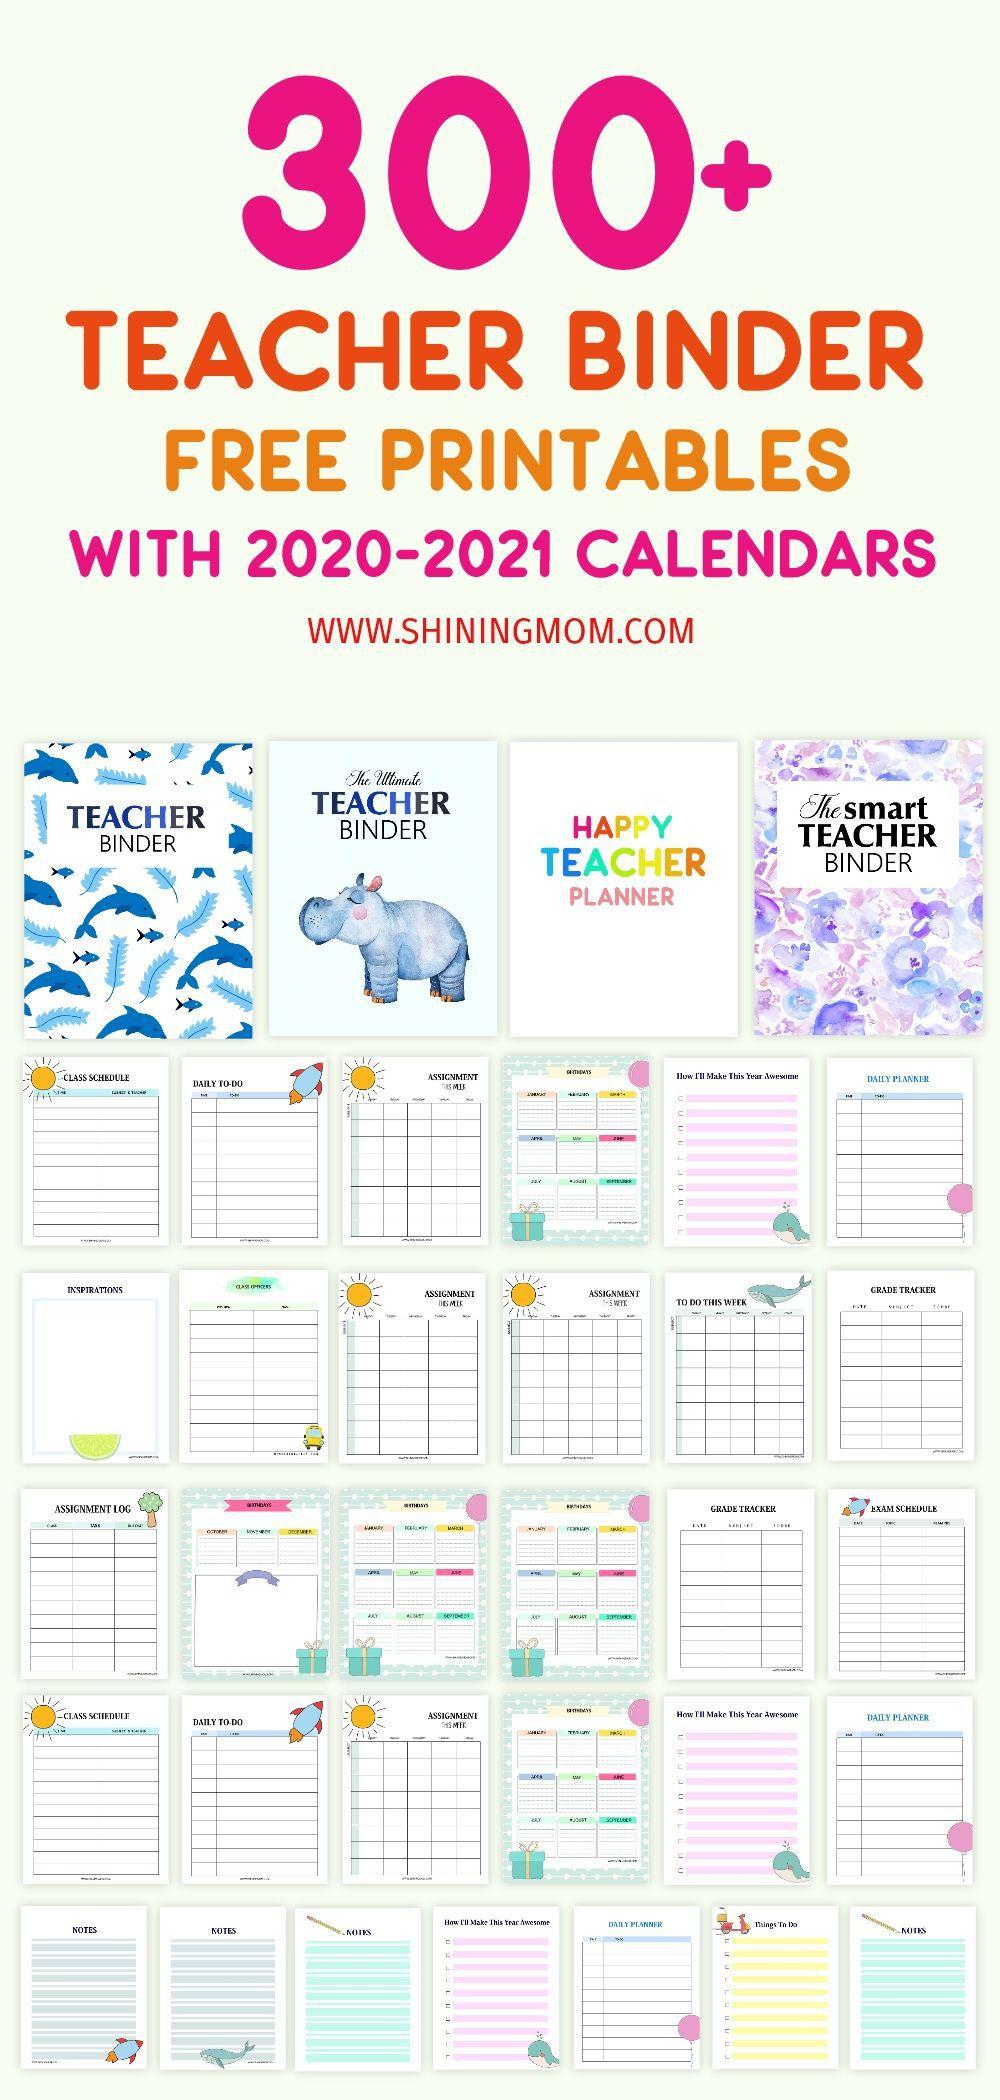 000 Sensational Free Printable Teacher Binder Template High Def  TemplatesFull